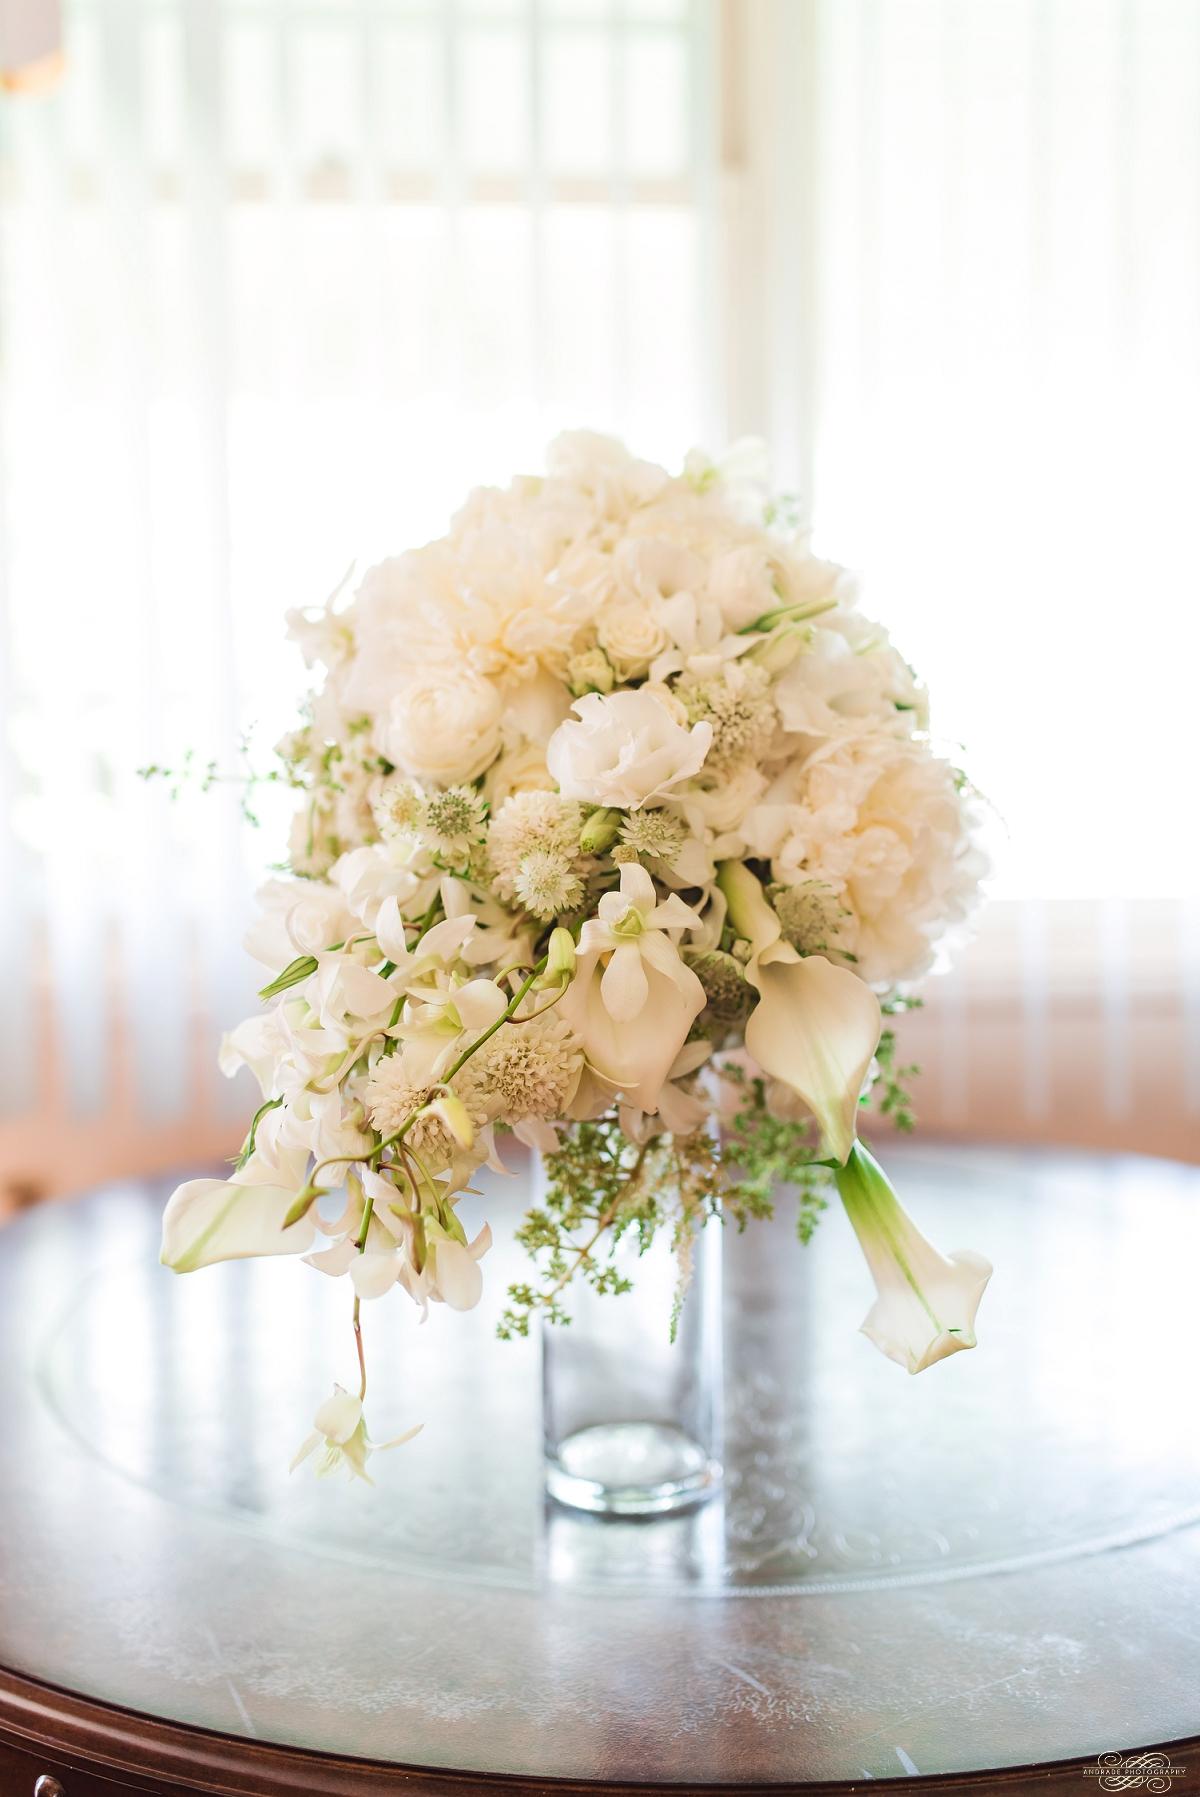 Venutis Banquet Chicago Illinois Wedding Photography 1 (12).jpg